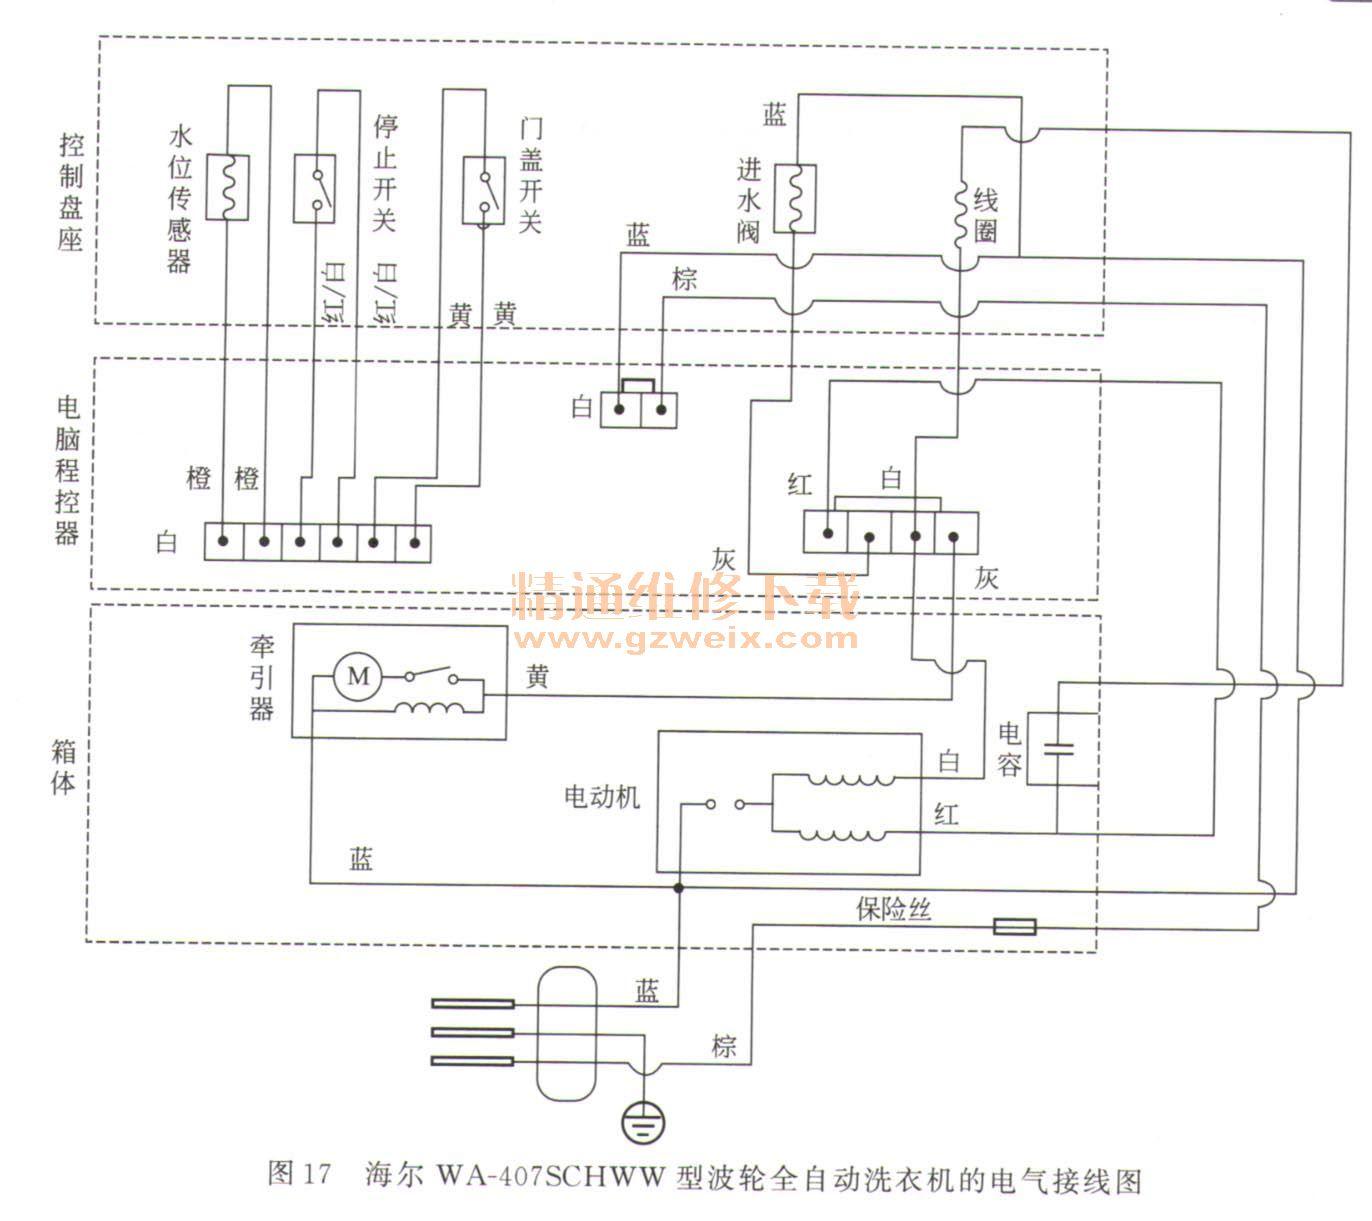 ww型波轮全自动洗衣机为例介绍电路的原理与故障代码